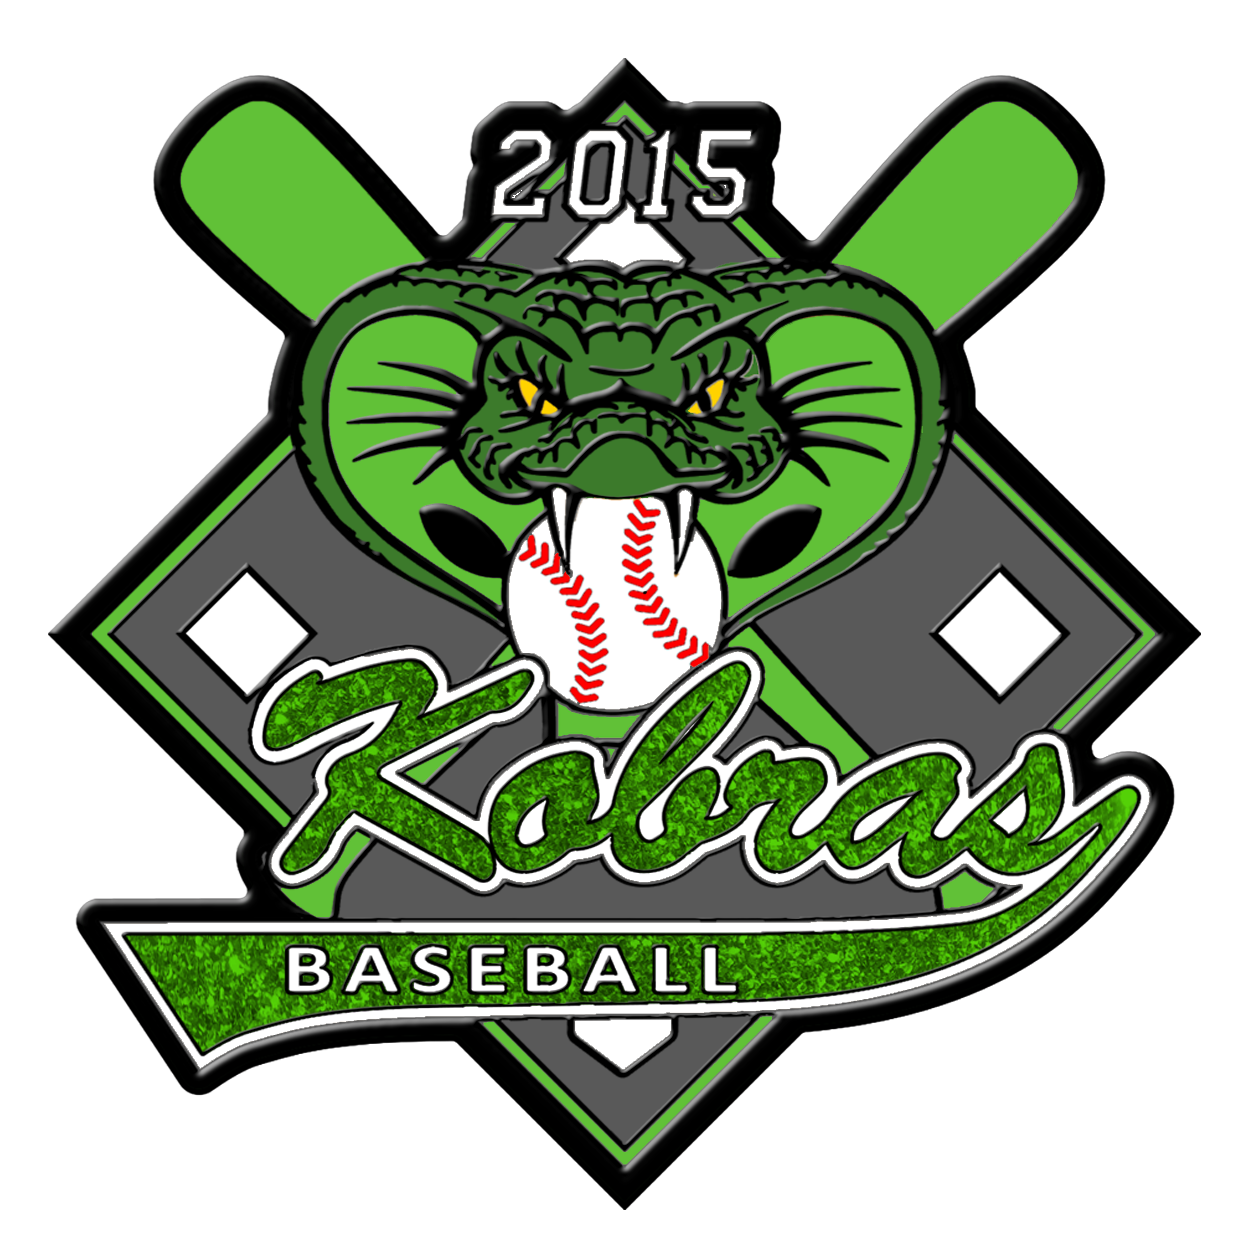 kobras baseball pins for trading custom made.png